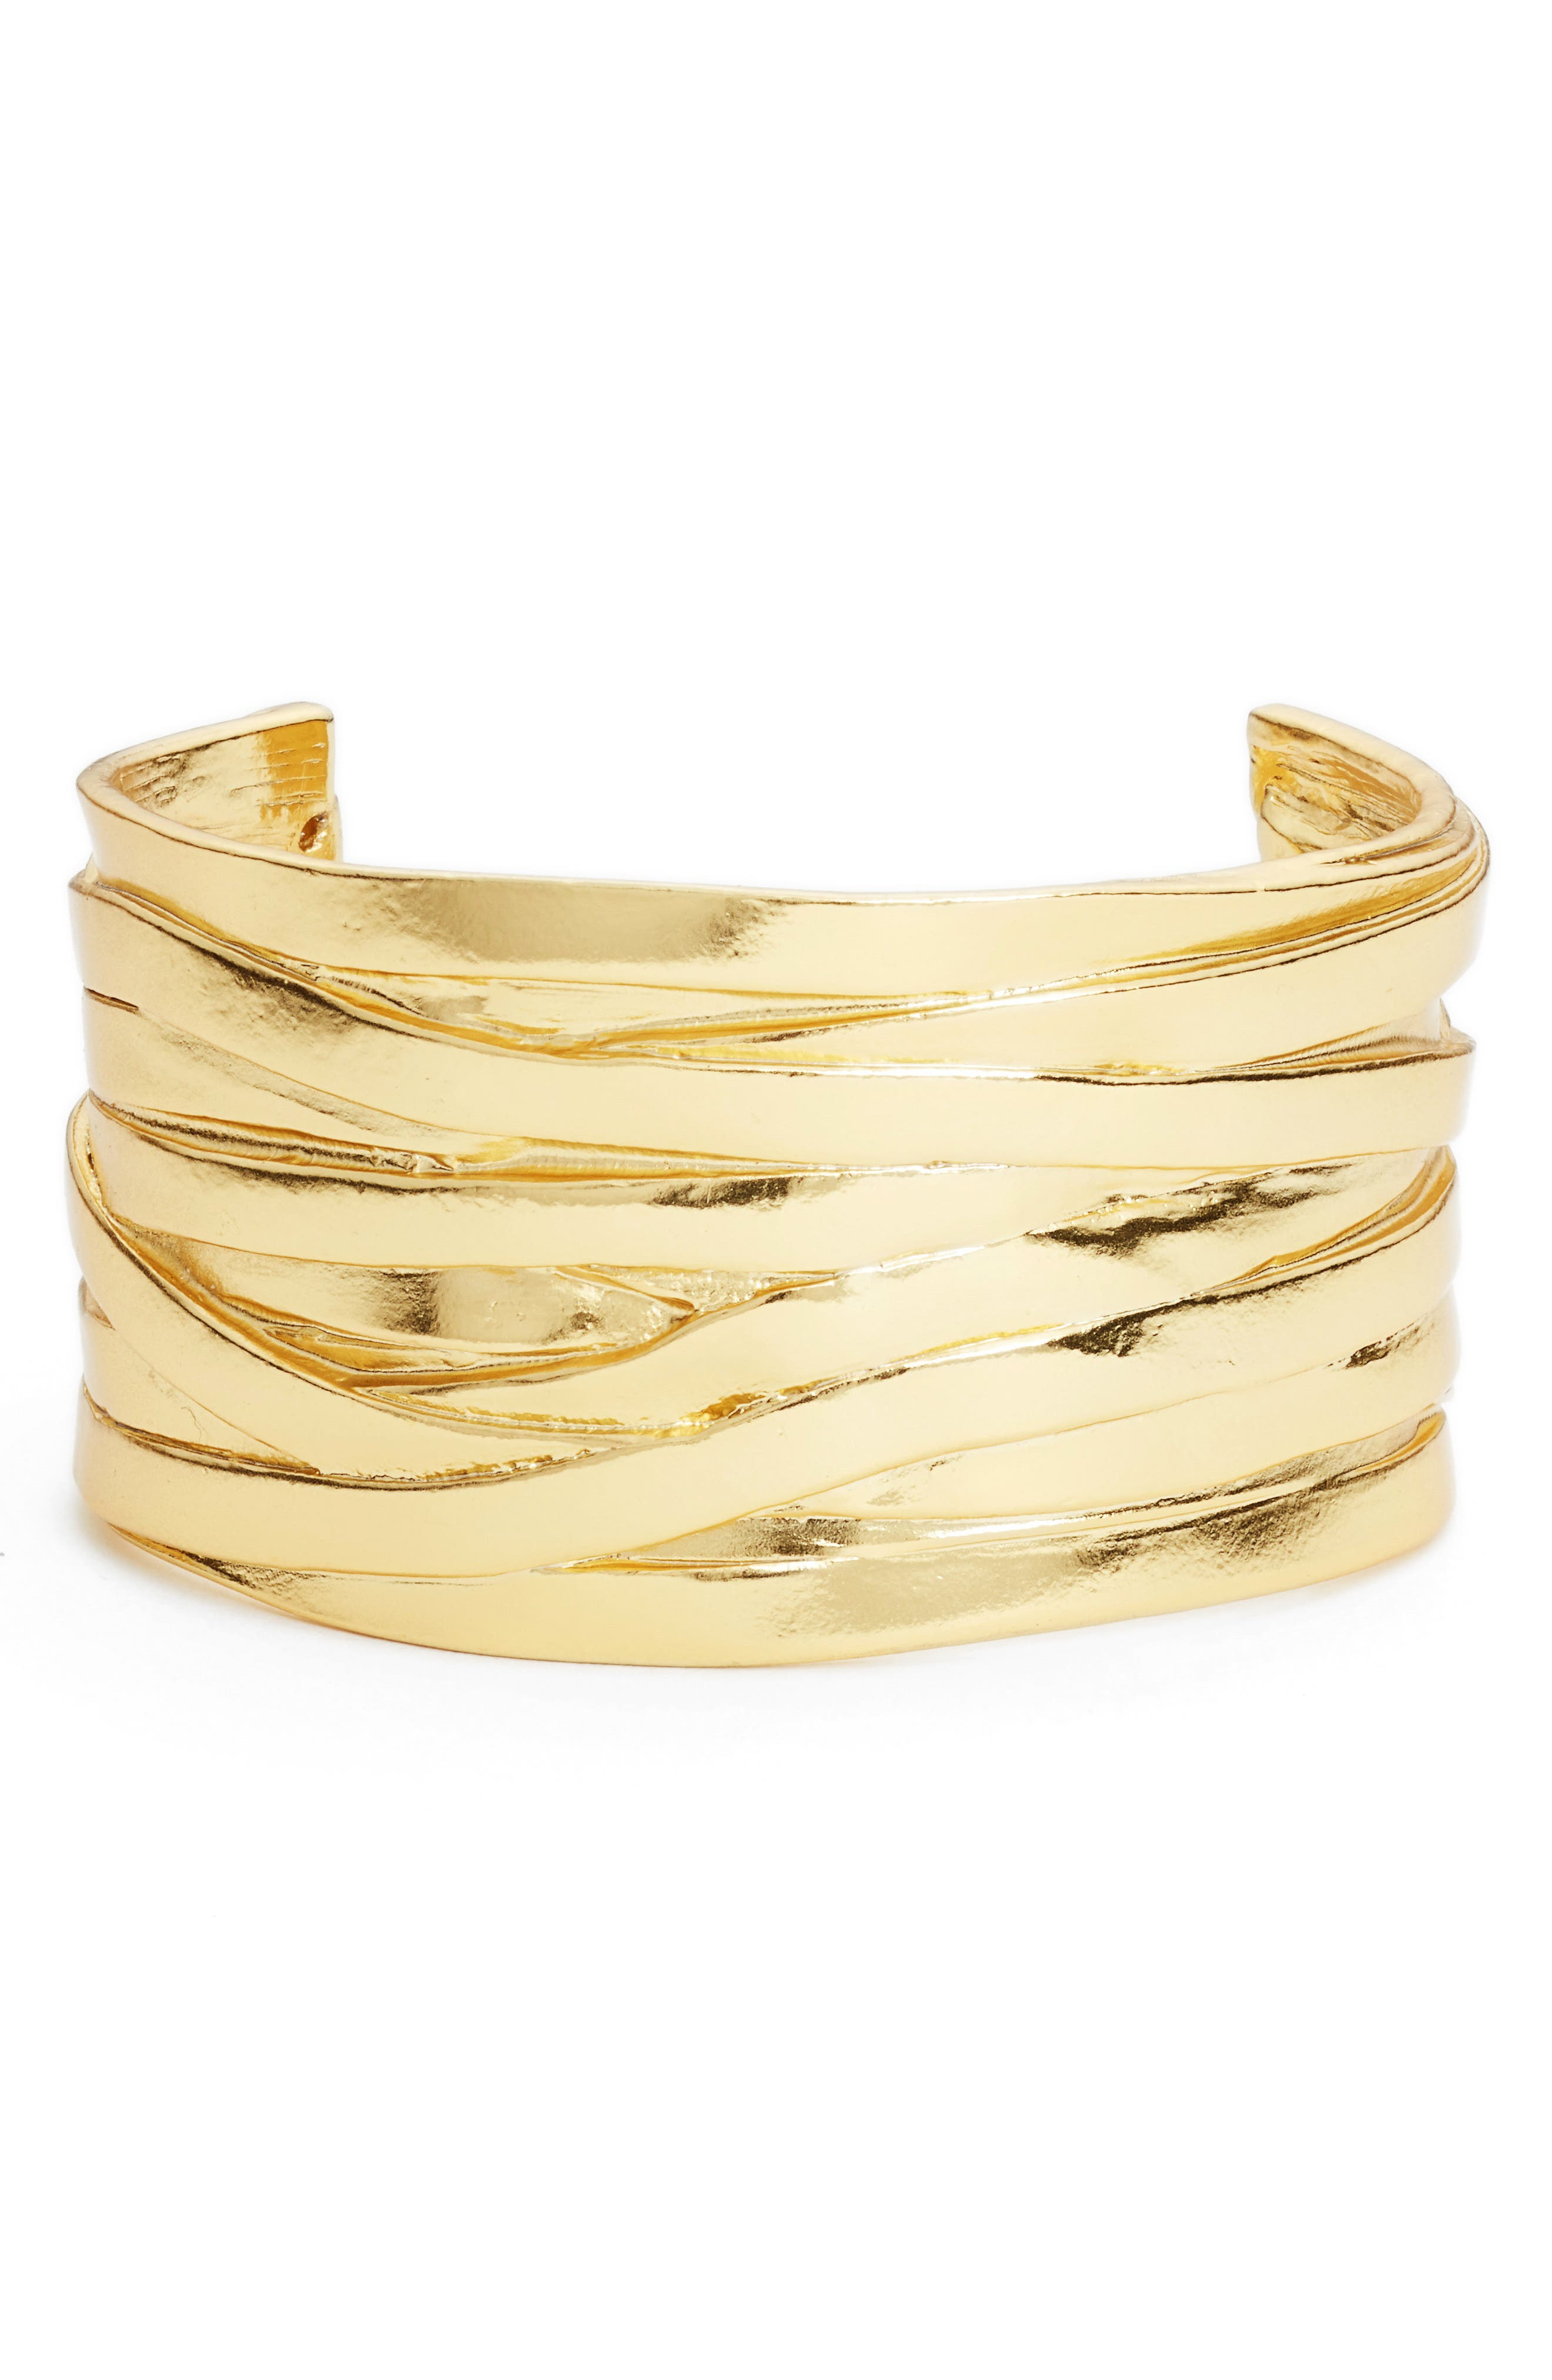 Alternate Image 1 Selected - Karine Sultan Angelique Wrist Cuff